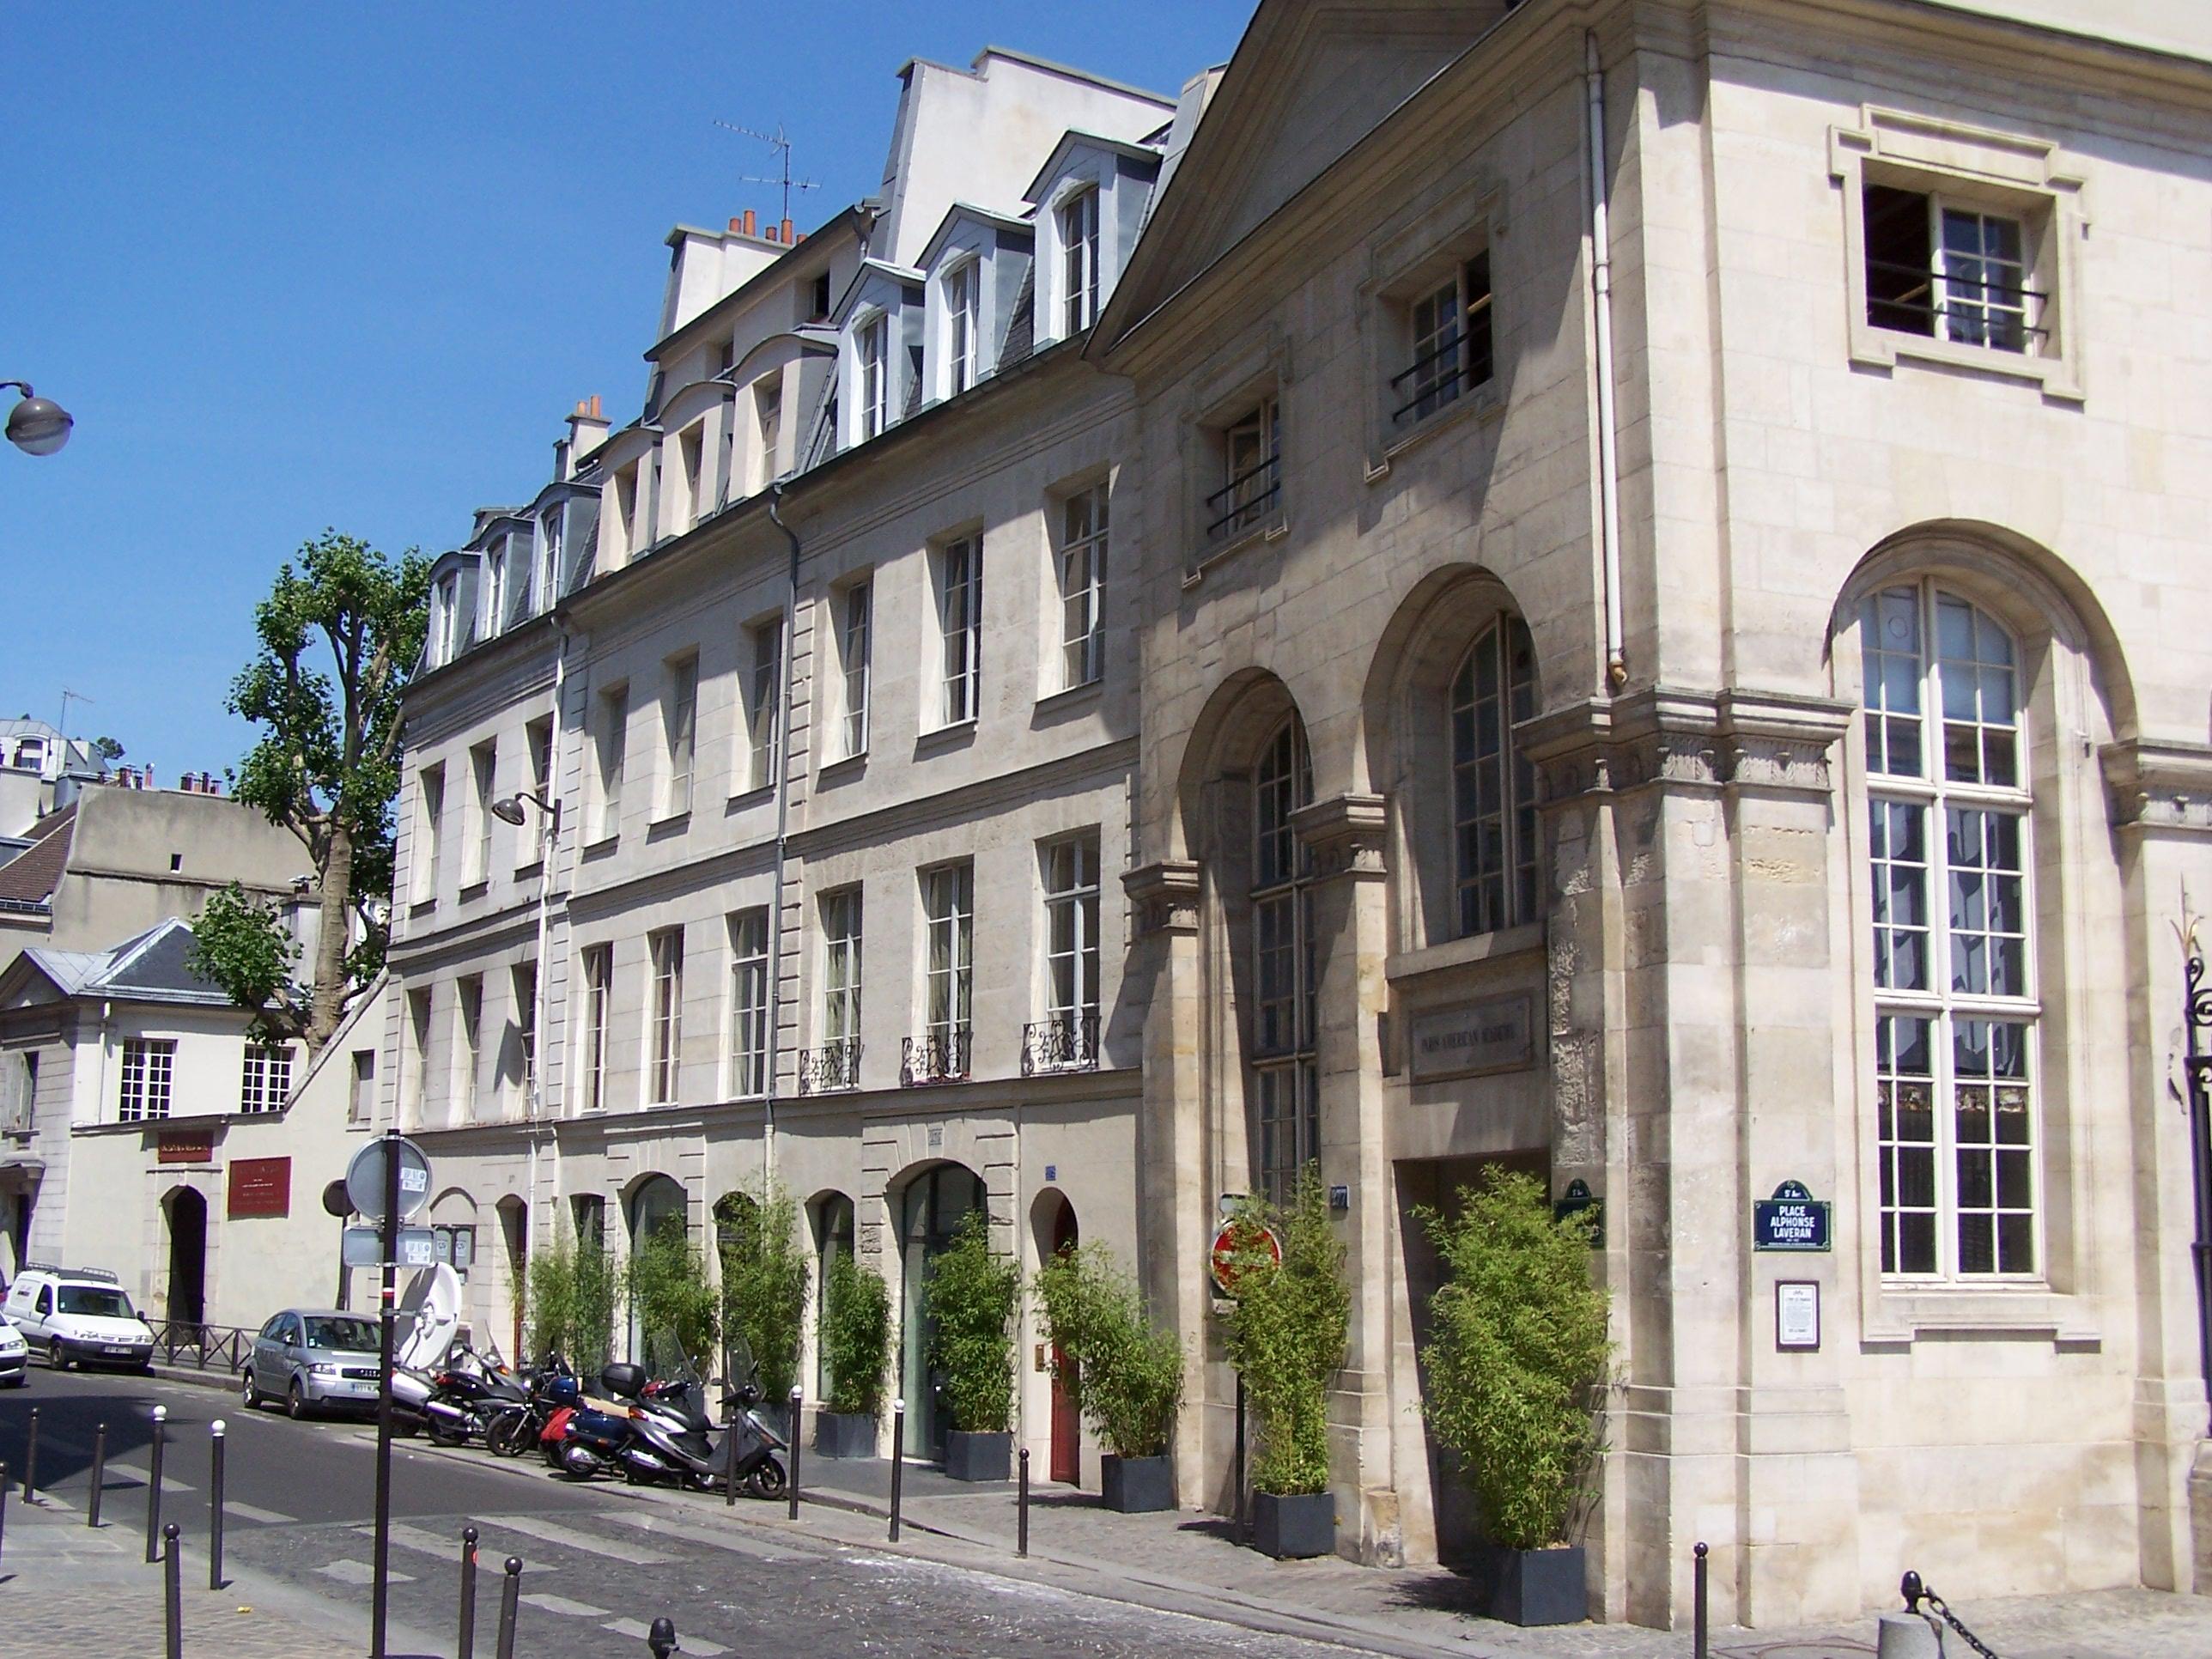 Paris American Academy Paris France File:paris American Academy